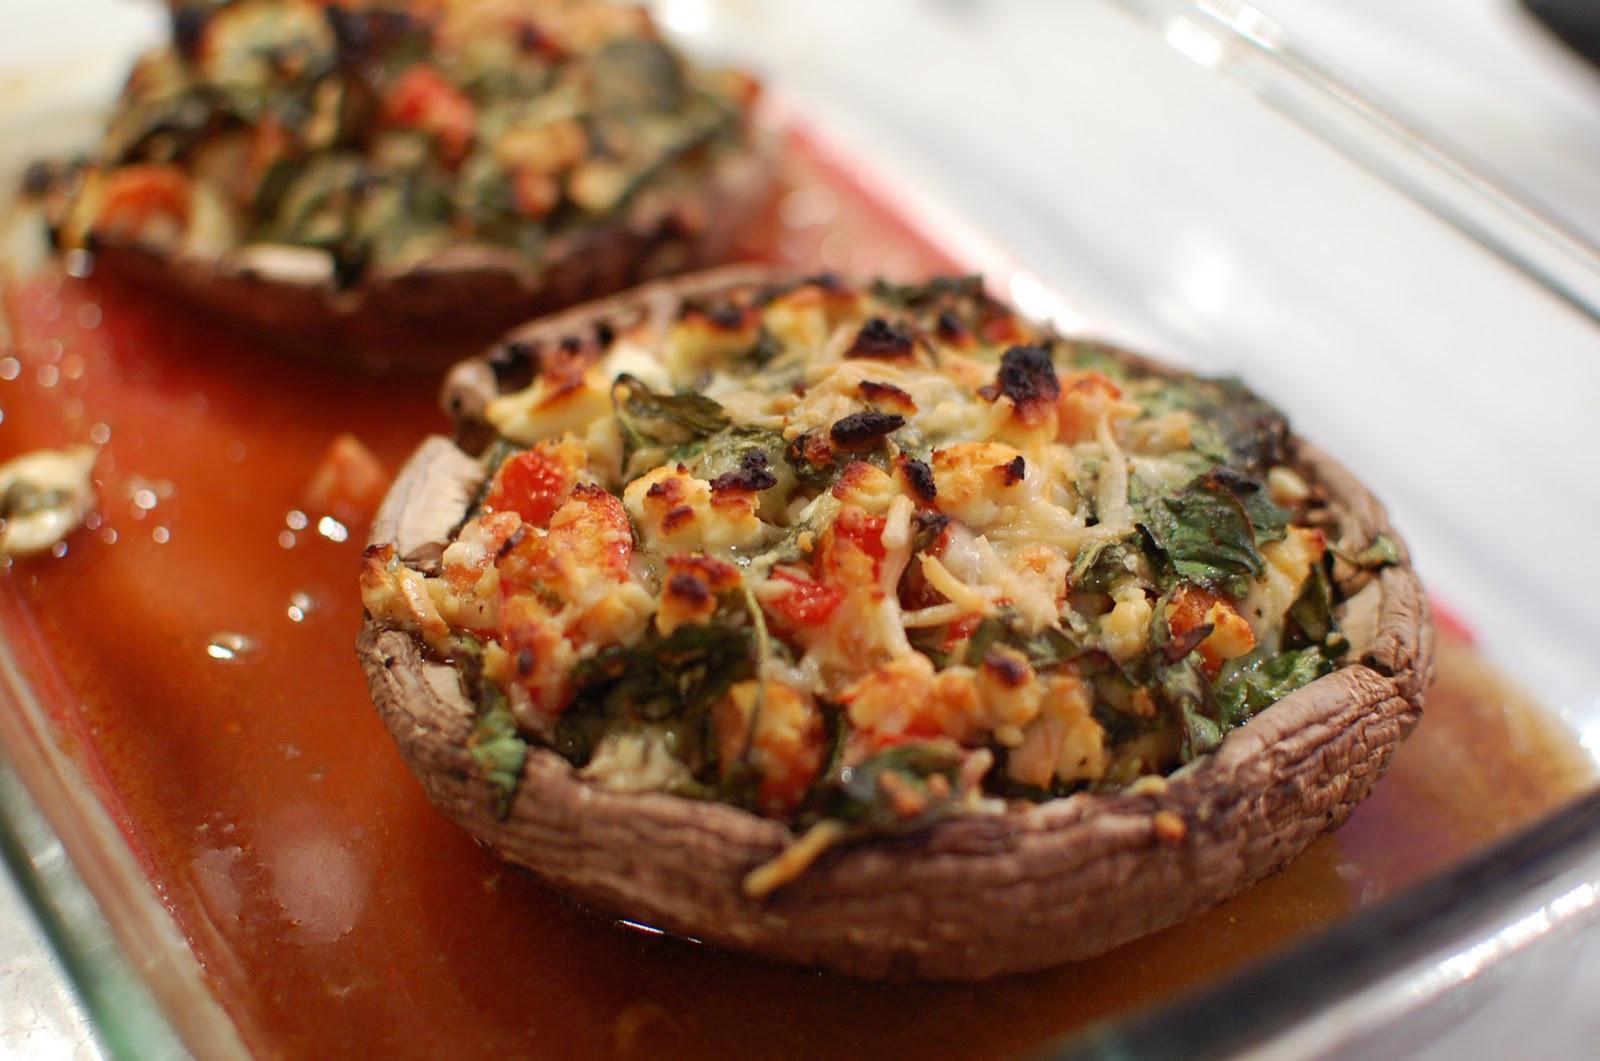 Stuffed Portabella Mushrooms  Reckless Abandon Spinach and Feta Stuffed Portabella